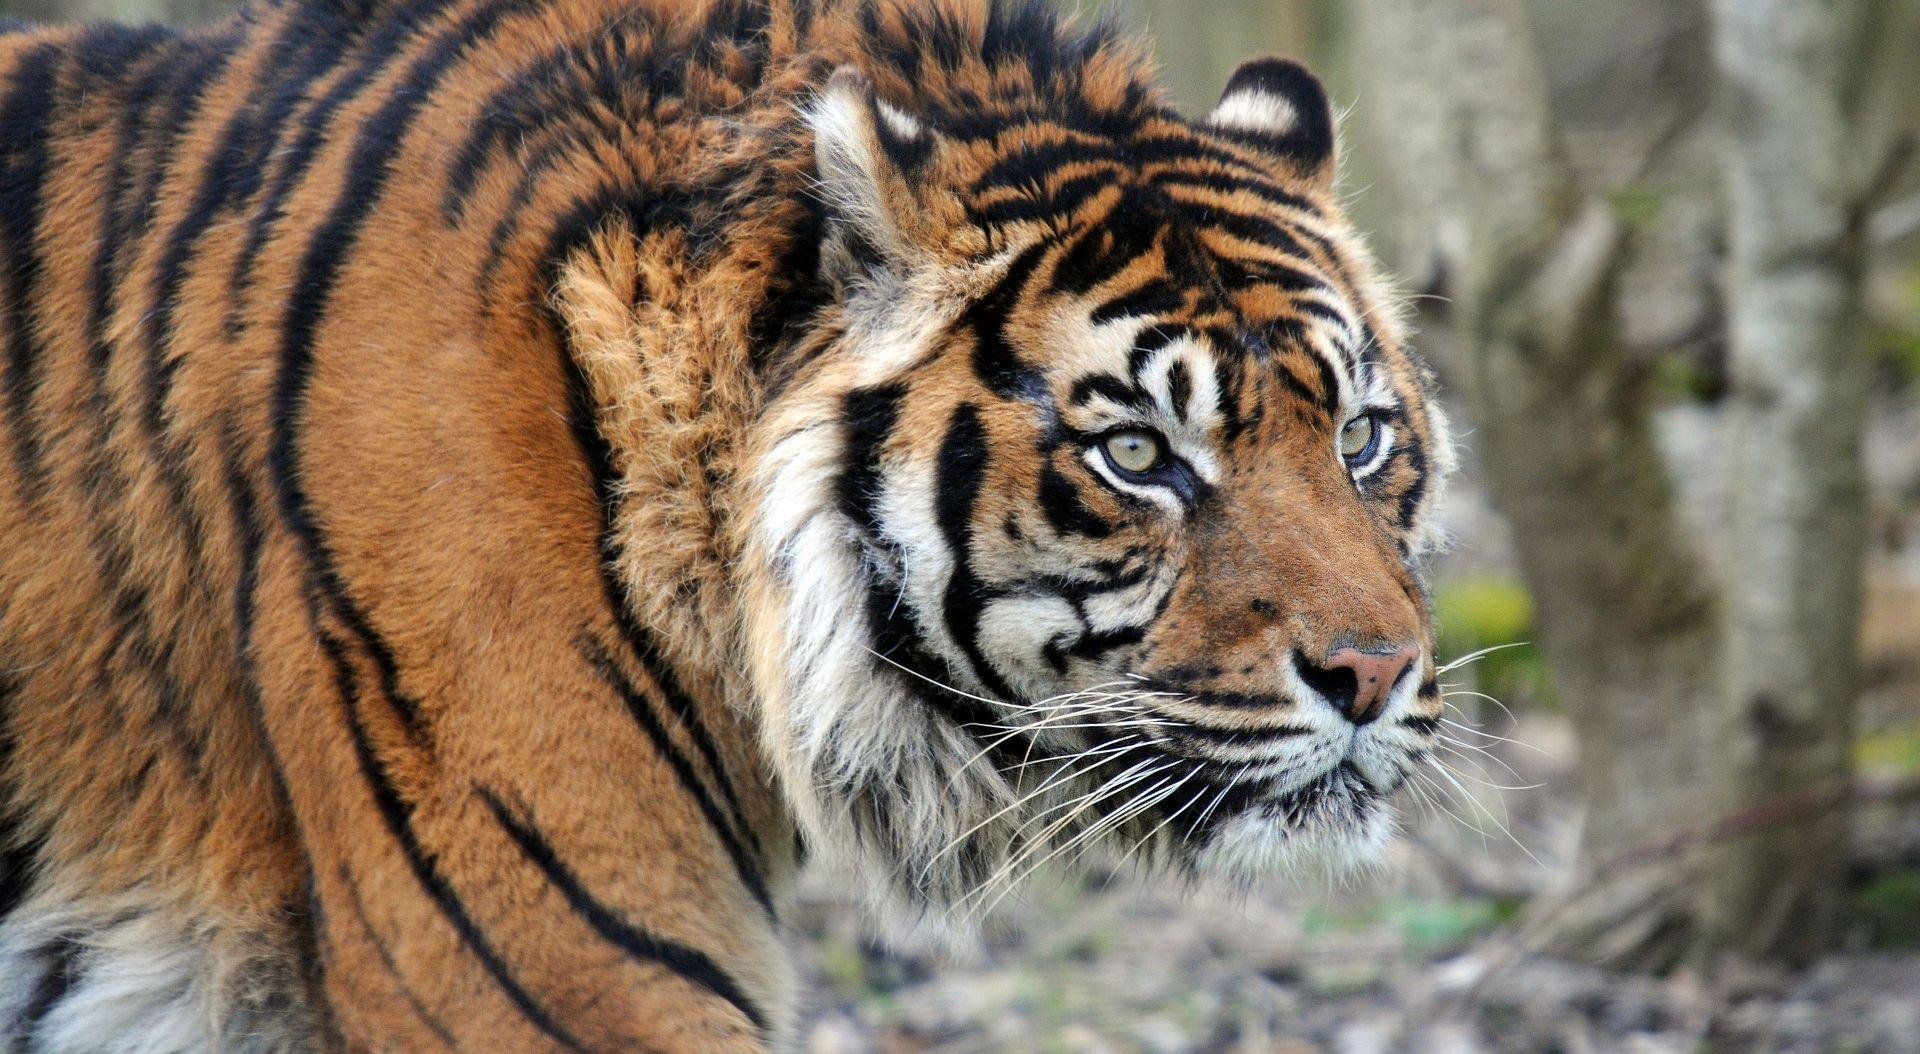 Tigrovi na slobodi blizu nizozemskog sela